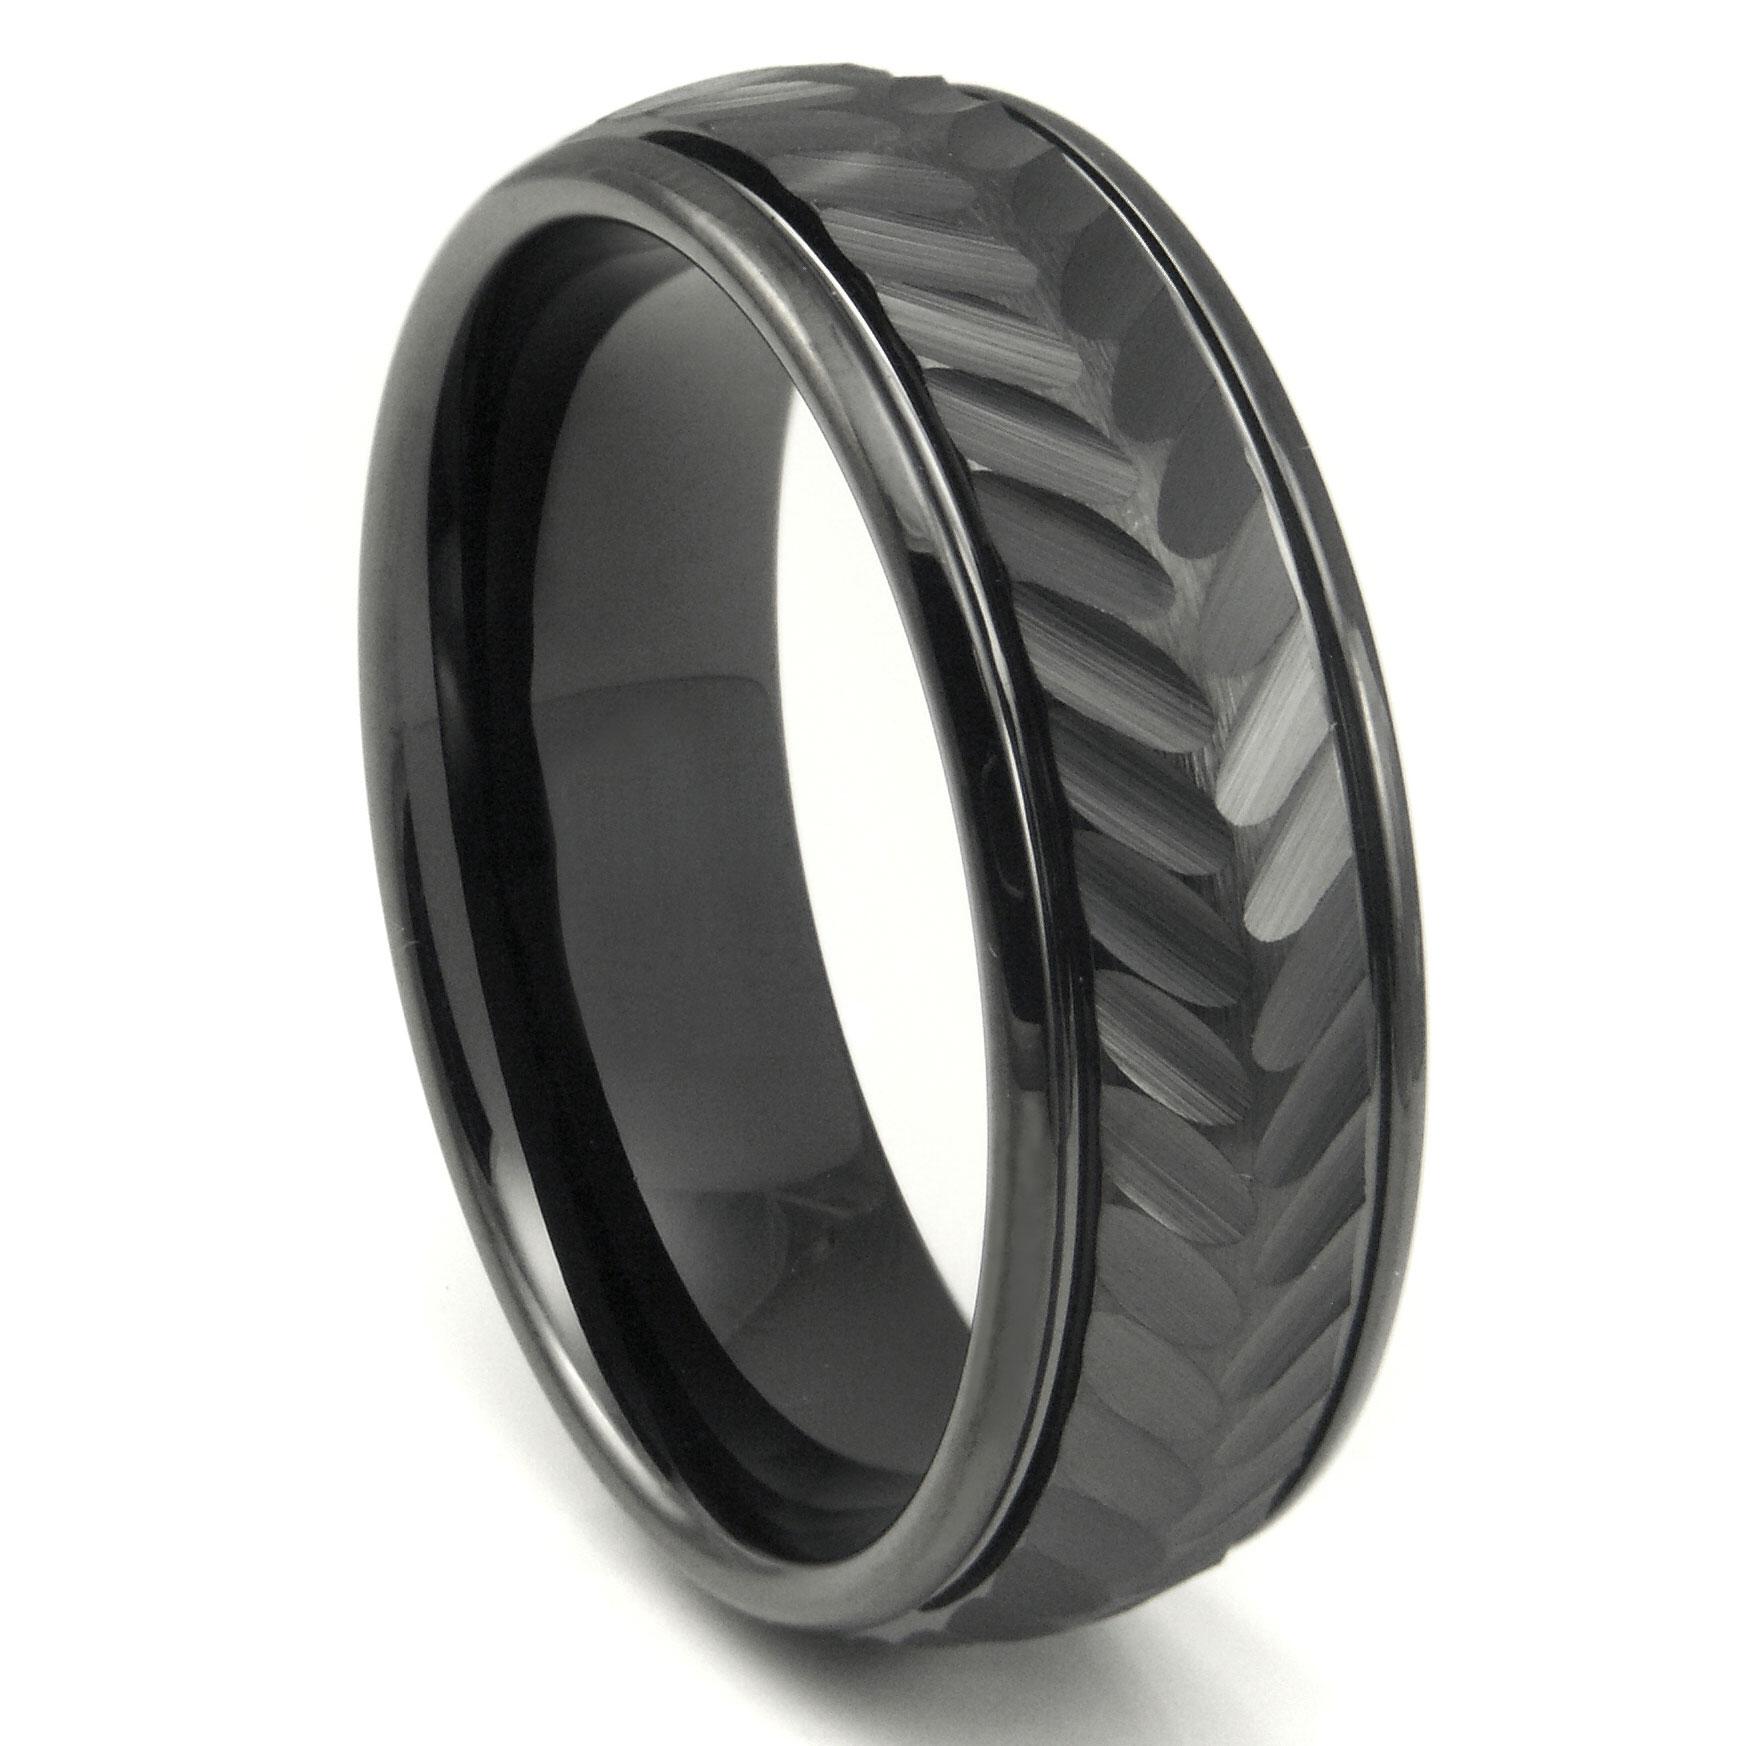 Black Tungsten Carbide 8MM Chevron Newport Wedding Band Ring P tungsten wedding band Home Men s Tungsten Carbide Rings Loading zoom